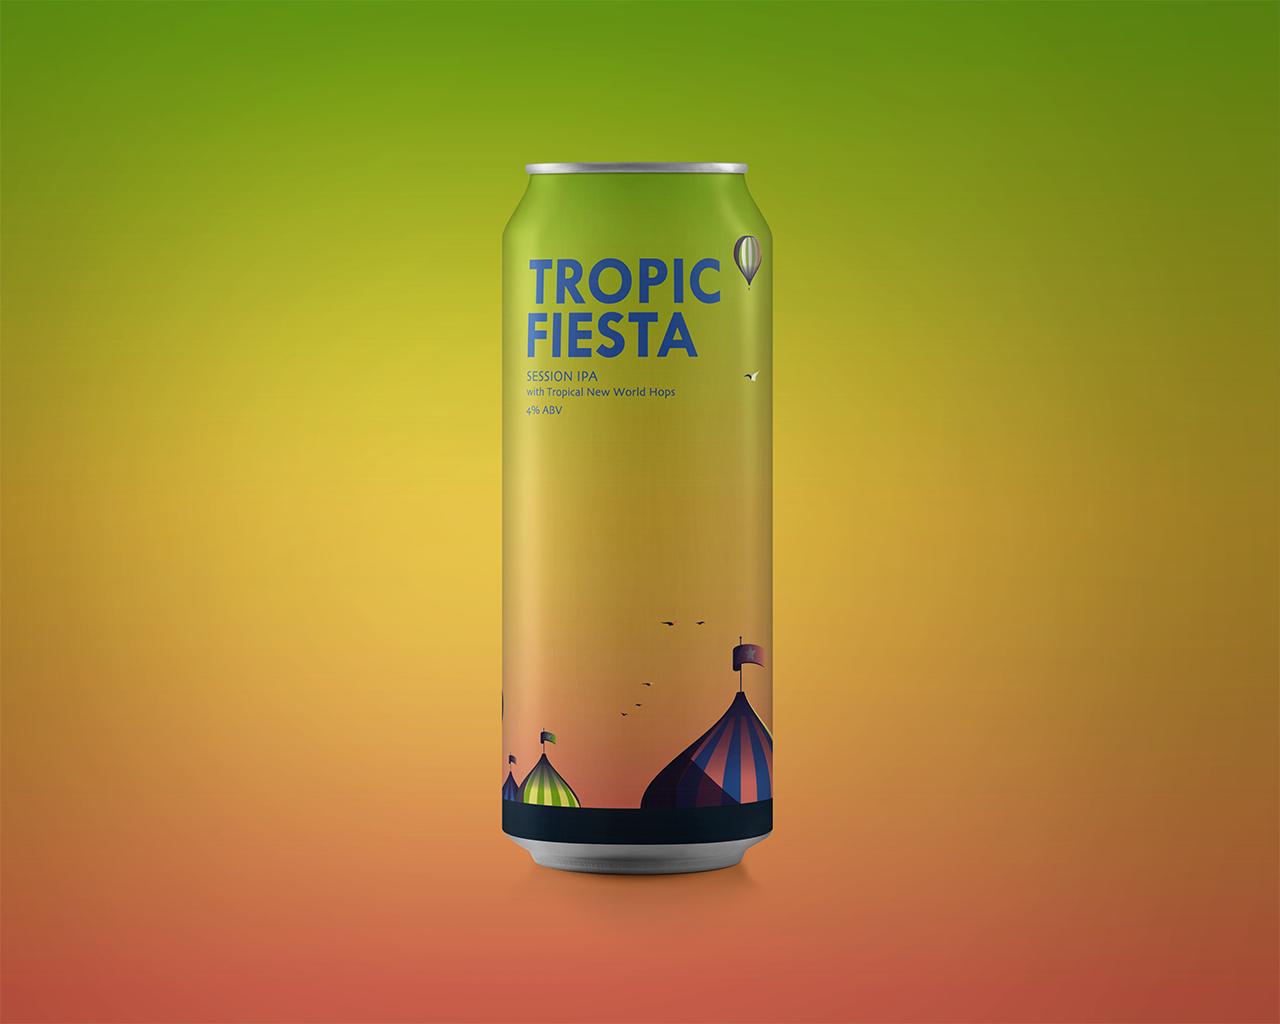 Tropic-Fiesta-Mockup-1280w-WEB.jpg